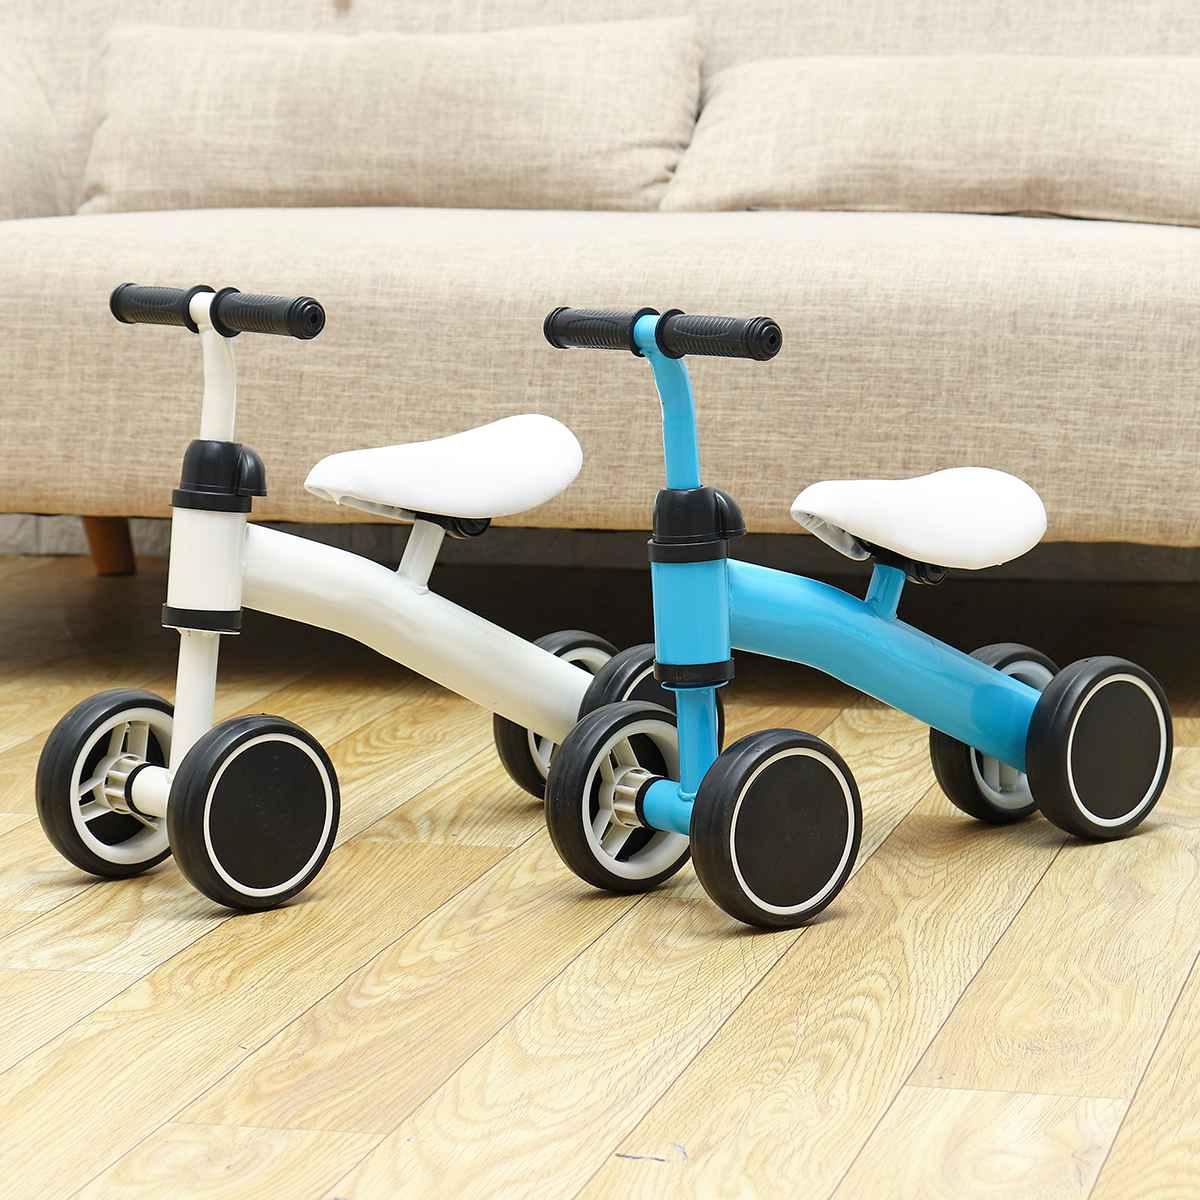 Bebek çocuk scooter'ı üç tekerlekli bisiklet 3-in-1 çocuk Scooter denge bisikleti Toddler binmek araba 3 tekerlekler denge bisiklet ayarlanabilir